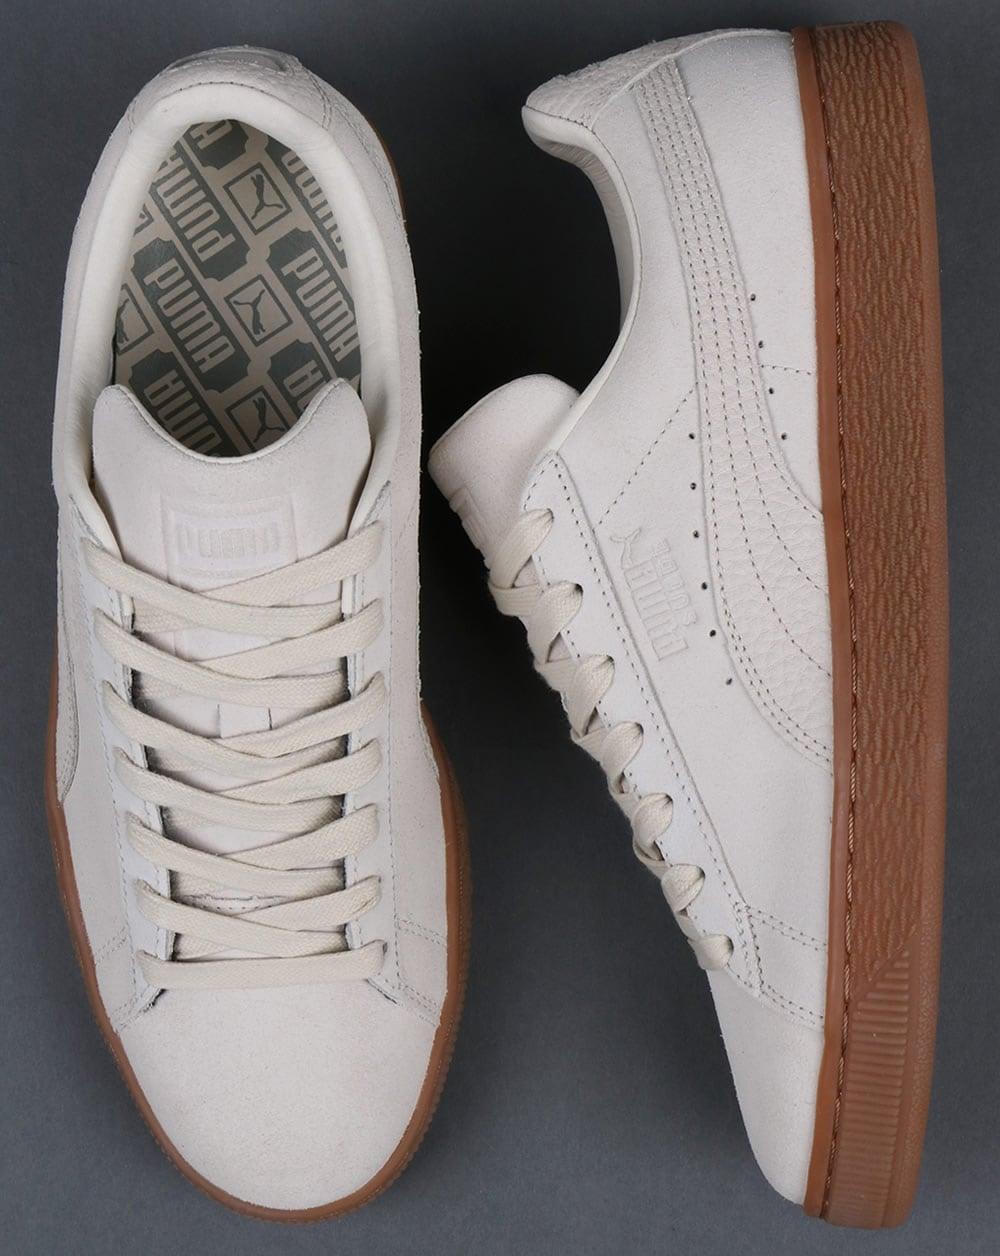 online store 894e1 74643 Puma Suede Classic Premium Trainers Off white Gum